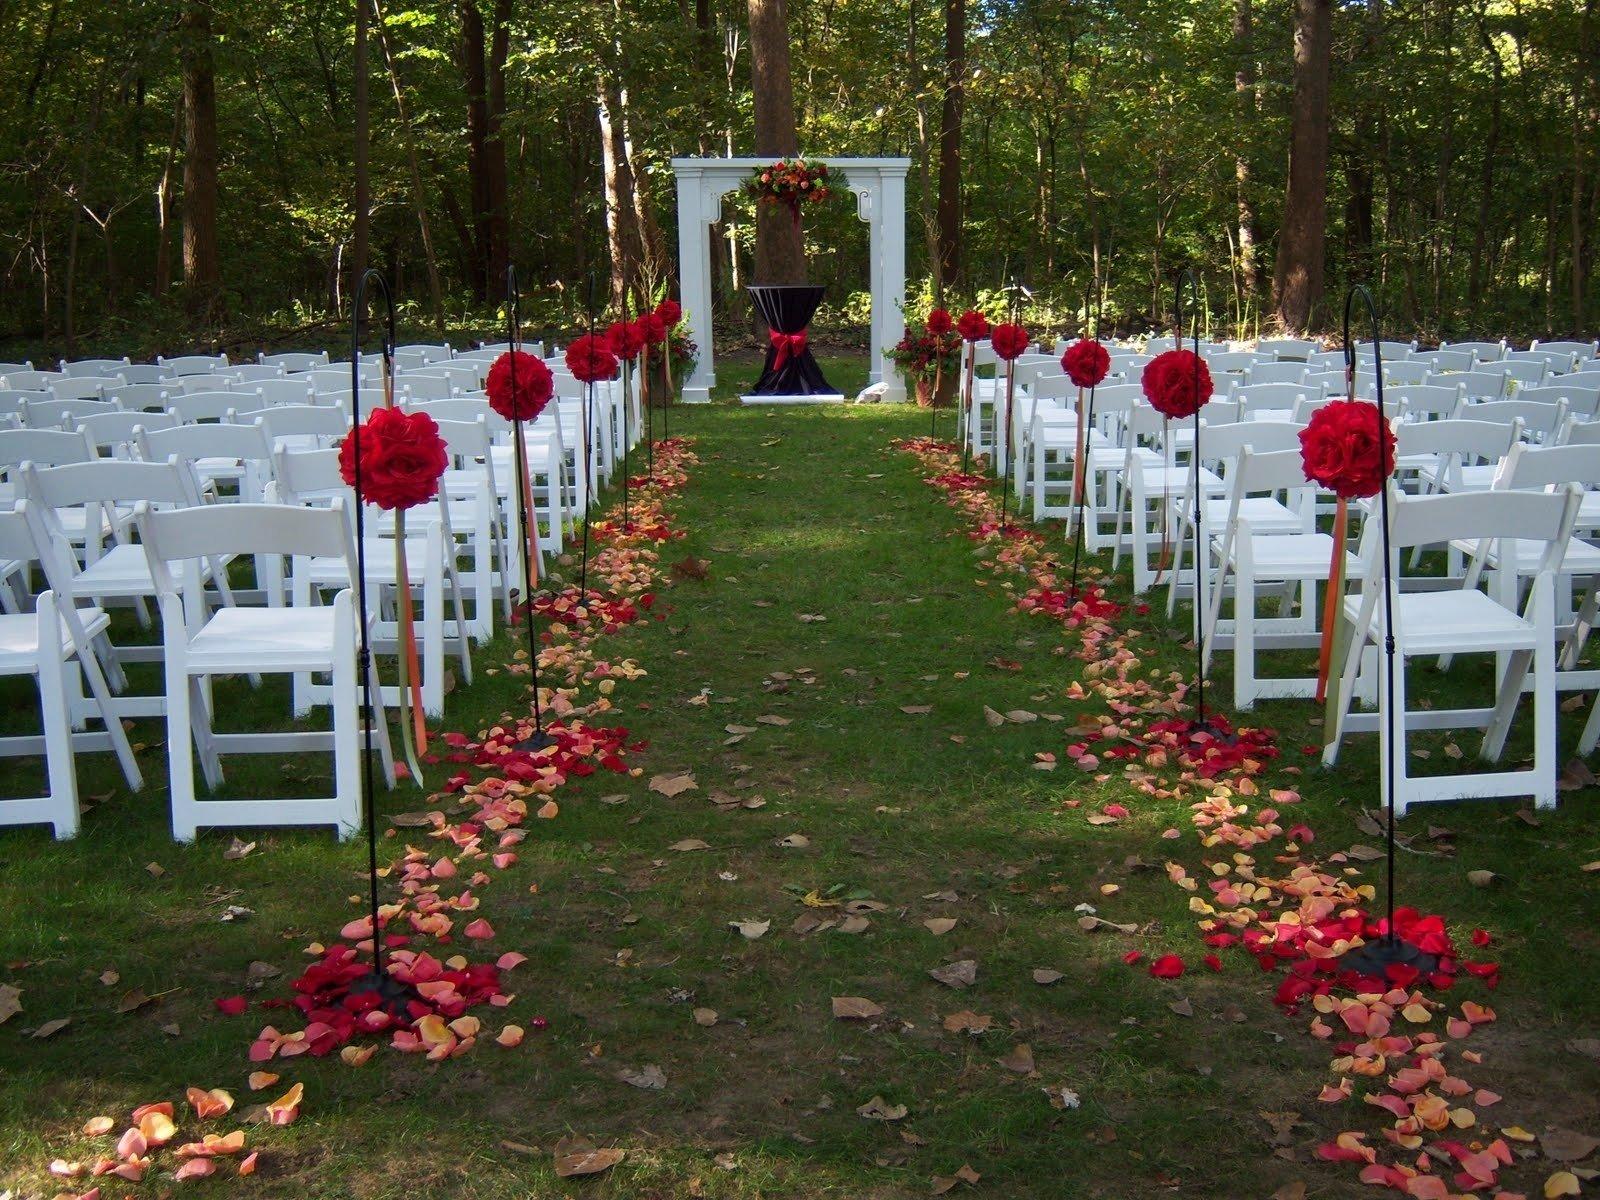 10 Awesome Outdoor Wedding Ideas For Fall disco xxyy in da city fall outdoor wedding fall outdoor wedding ideas 2021